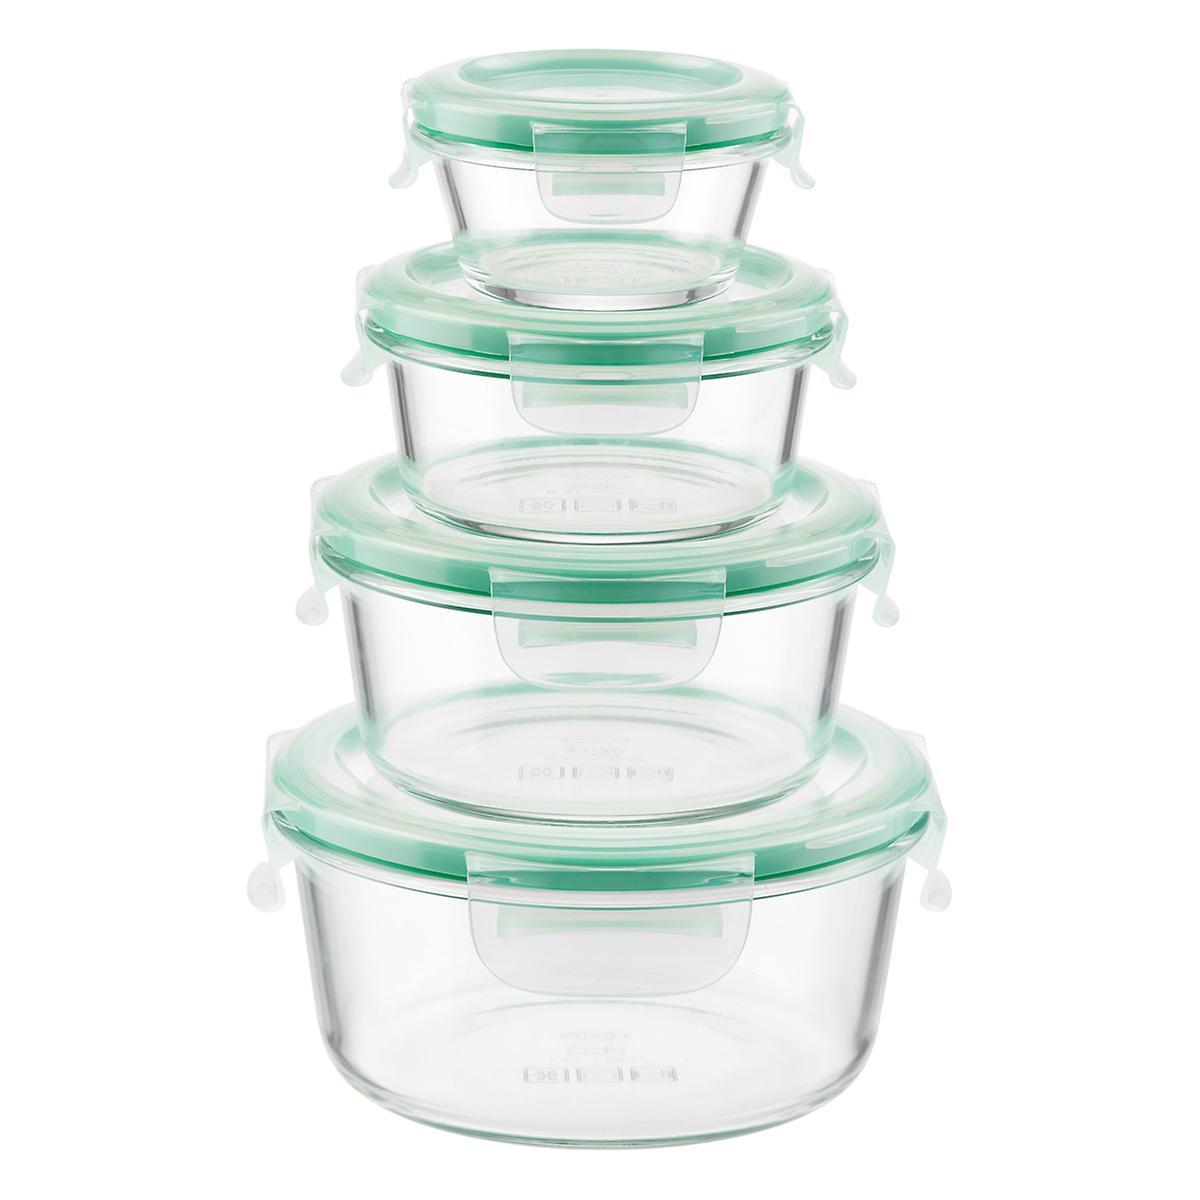 oxo good grips 8 piece smart seal round glass food storage. Black Bedroom Furniture Sets. Home Design Ideas